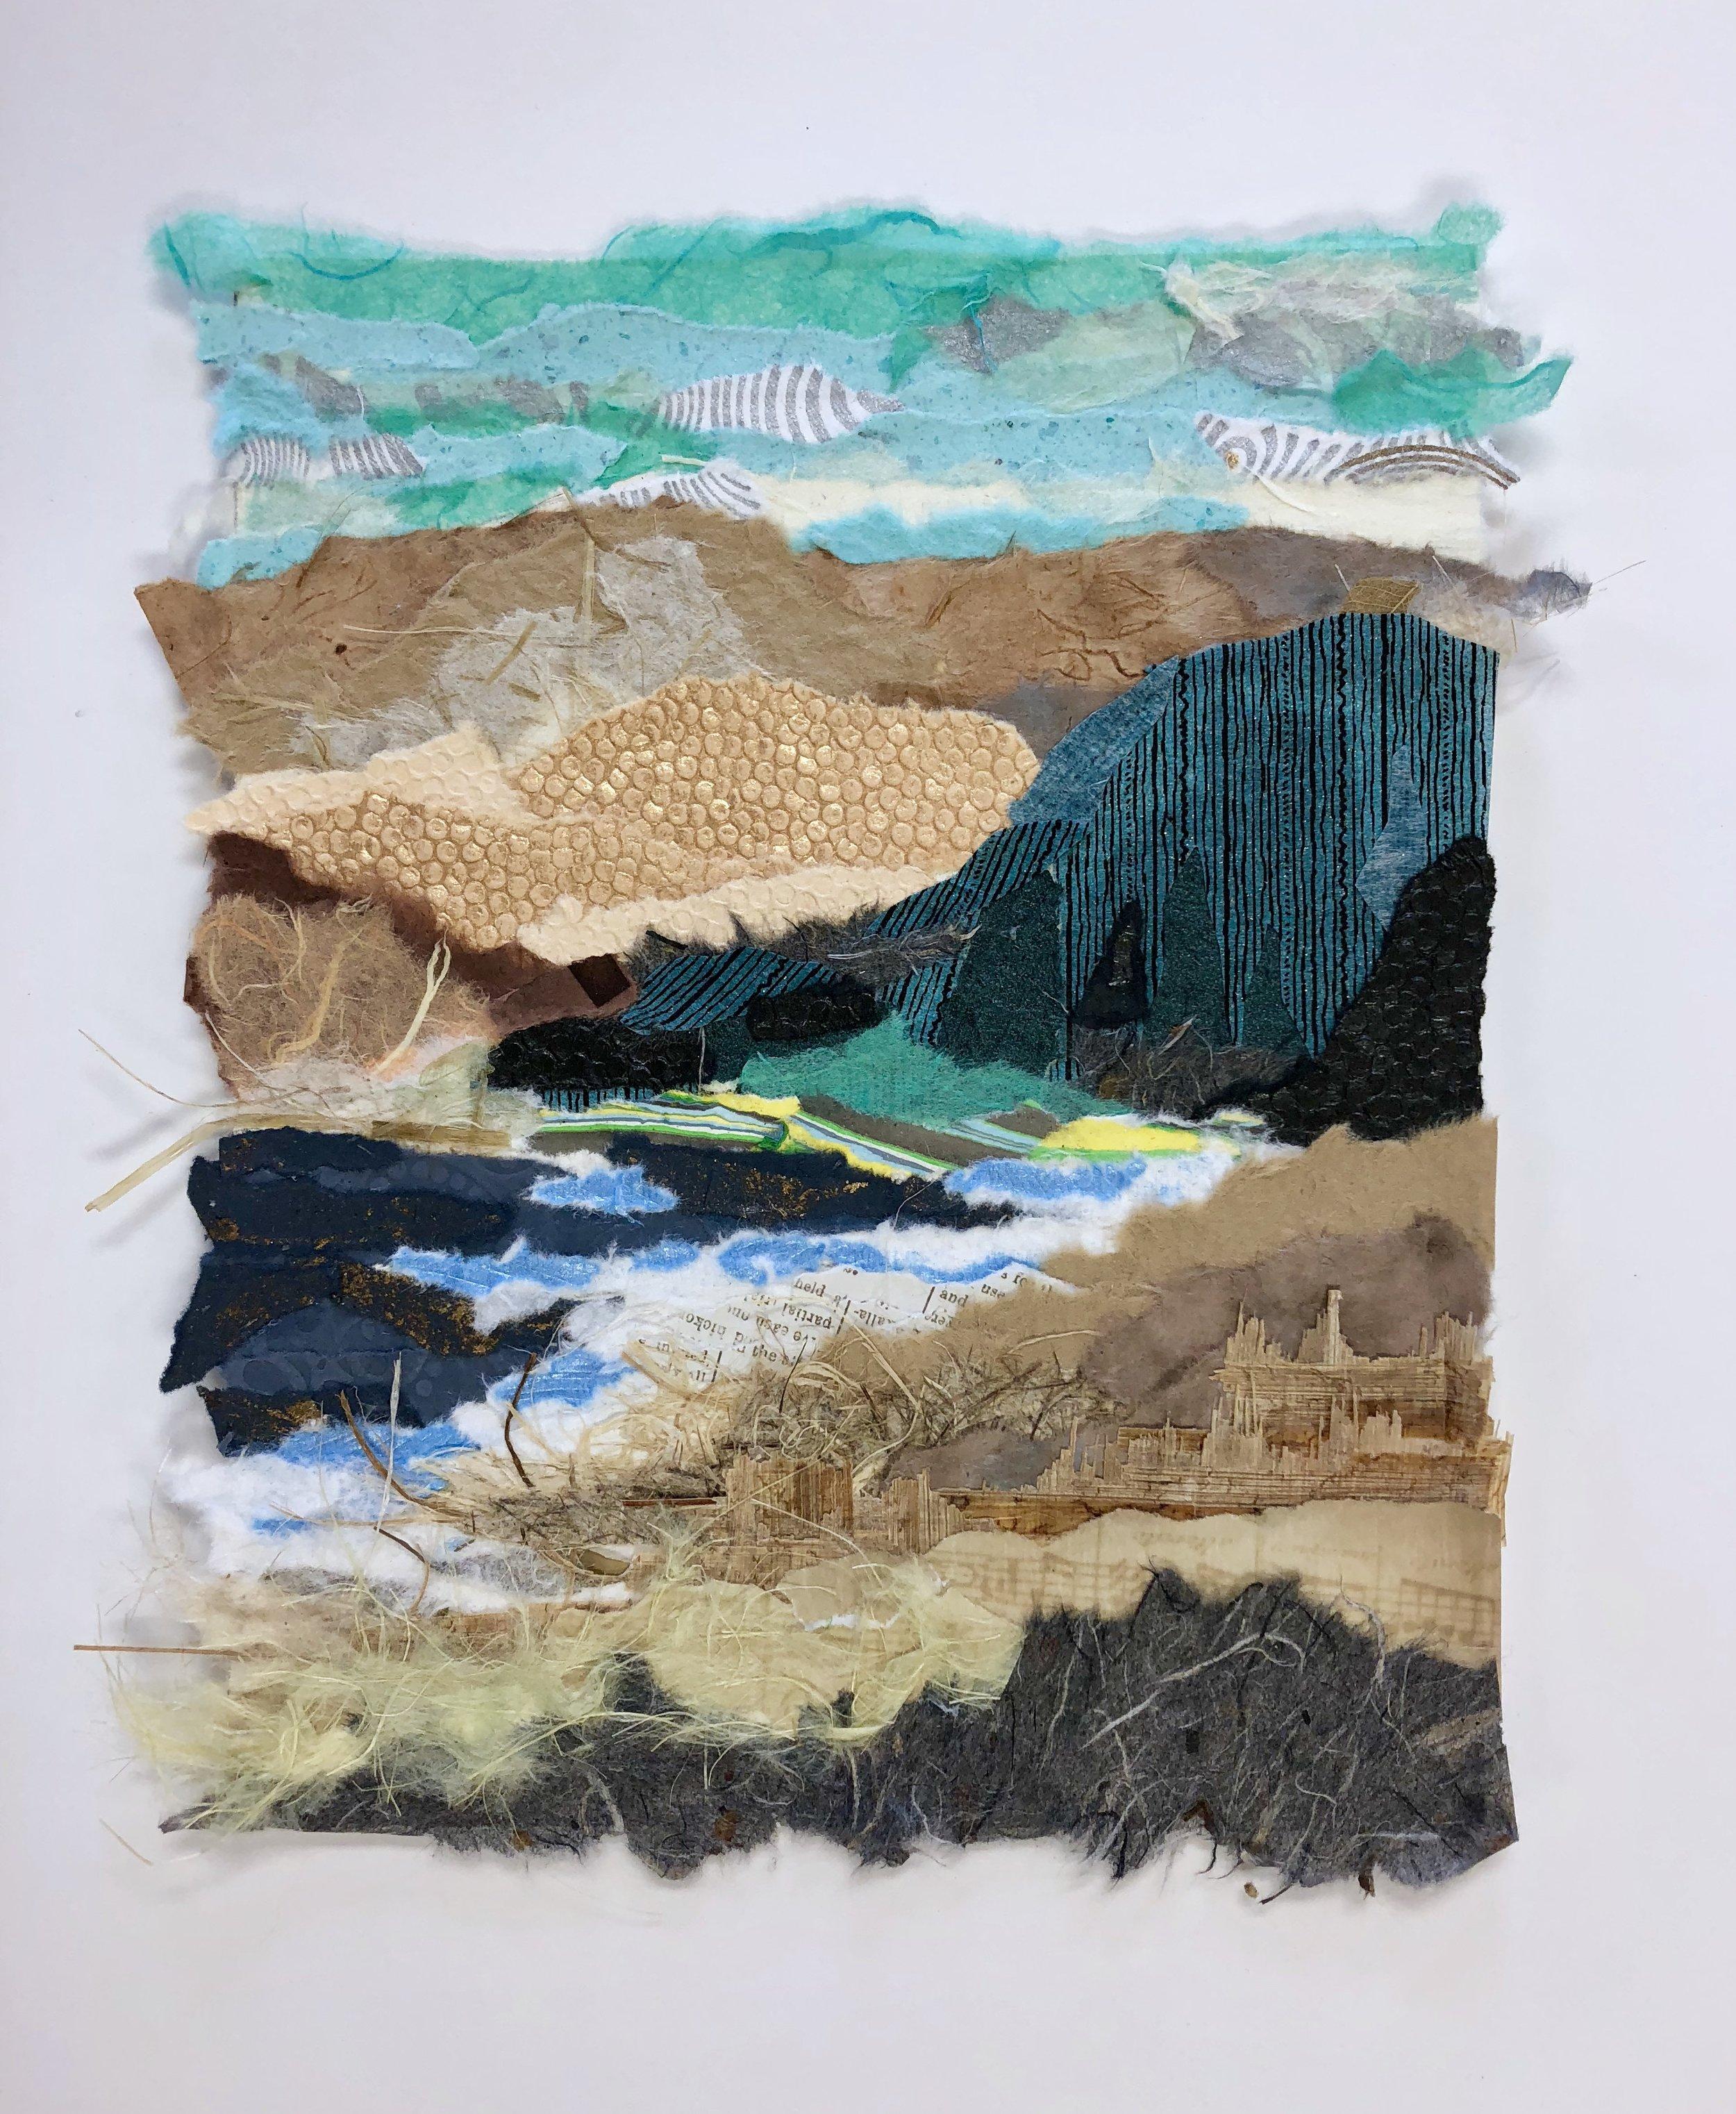 Santa Cruz Island - Channel Islands National park - collage